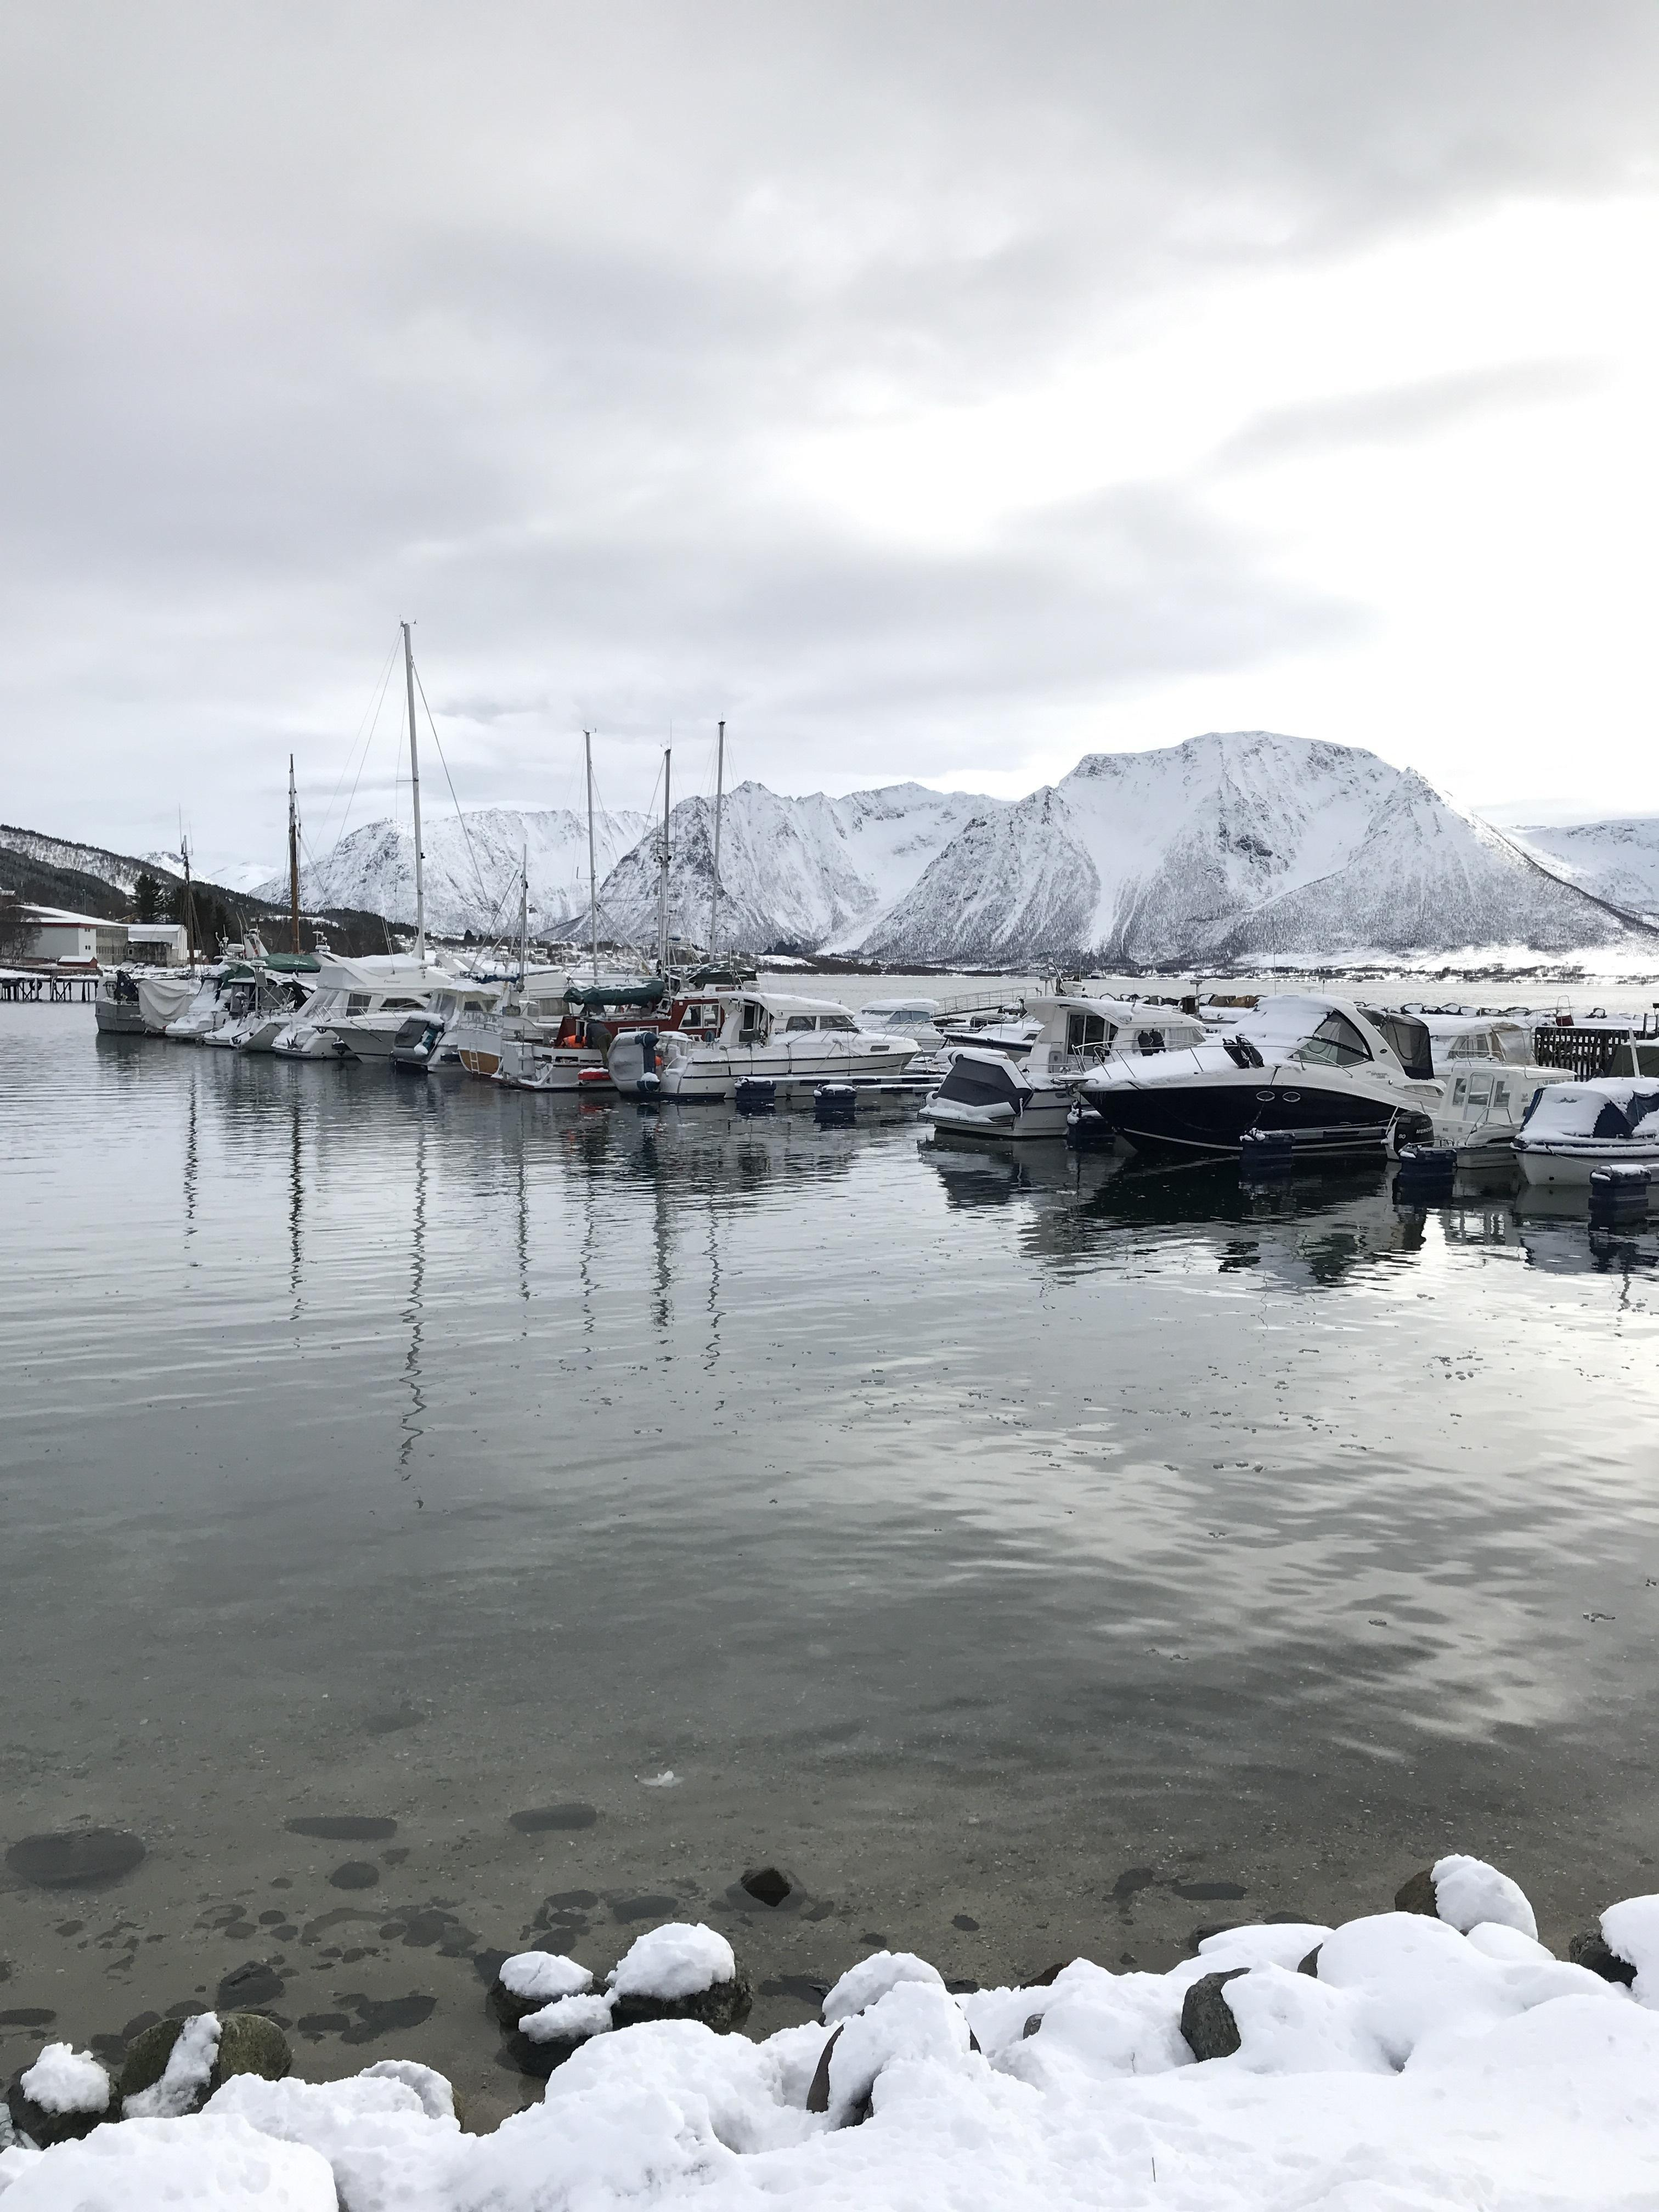 https://www.marinasolutions.no/uploads/201904-Maurnes-båtforening-4.JPG